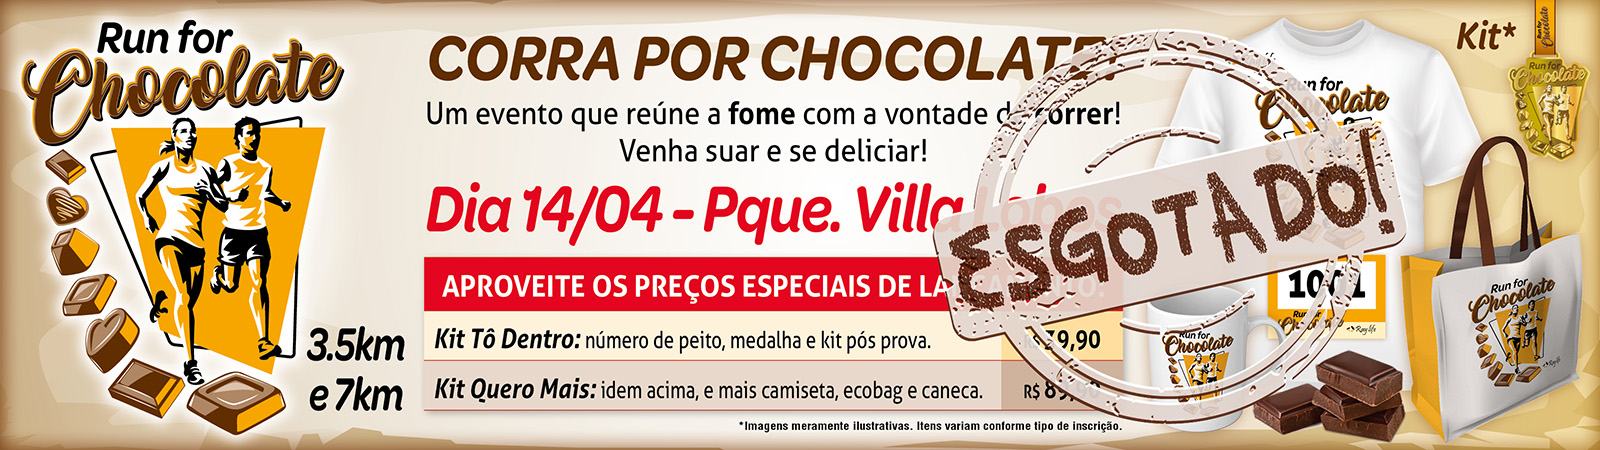 Run for Chocolate 2019